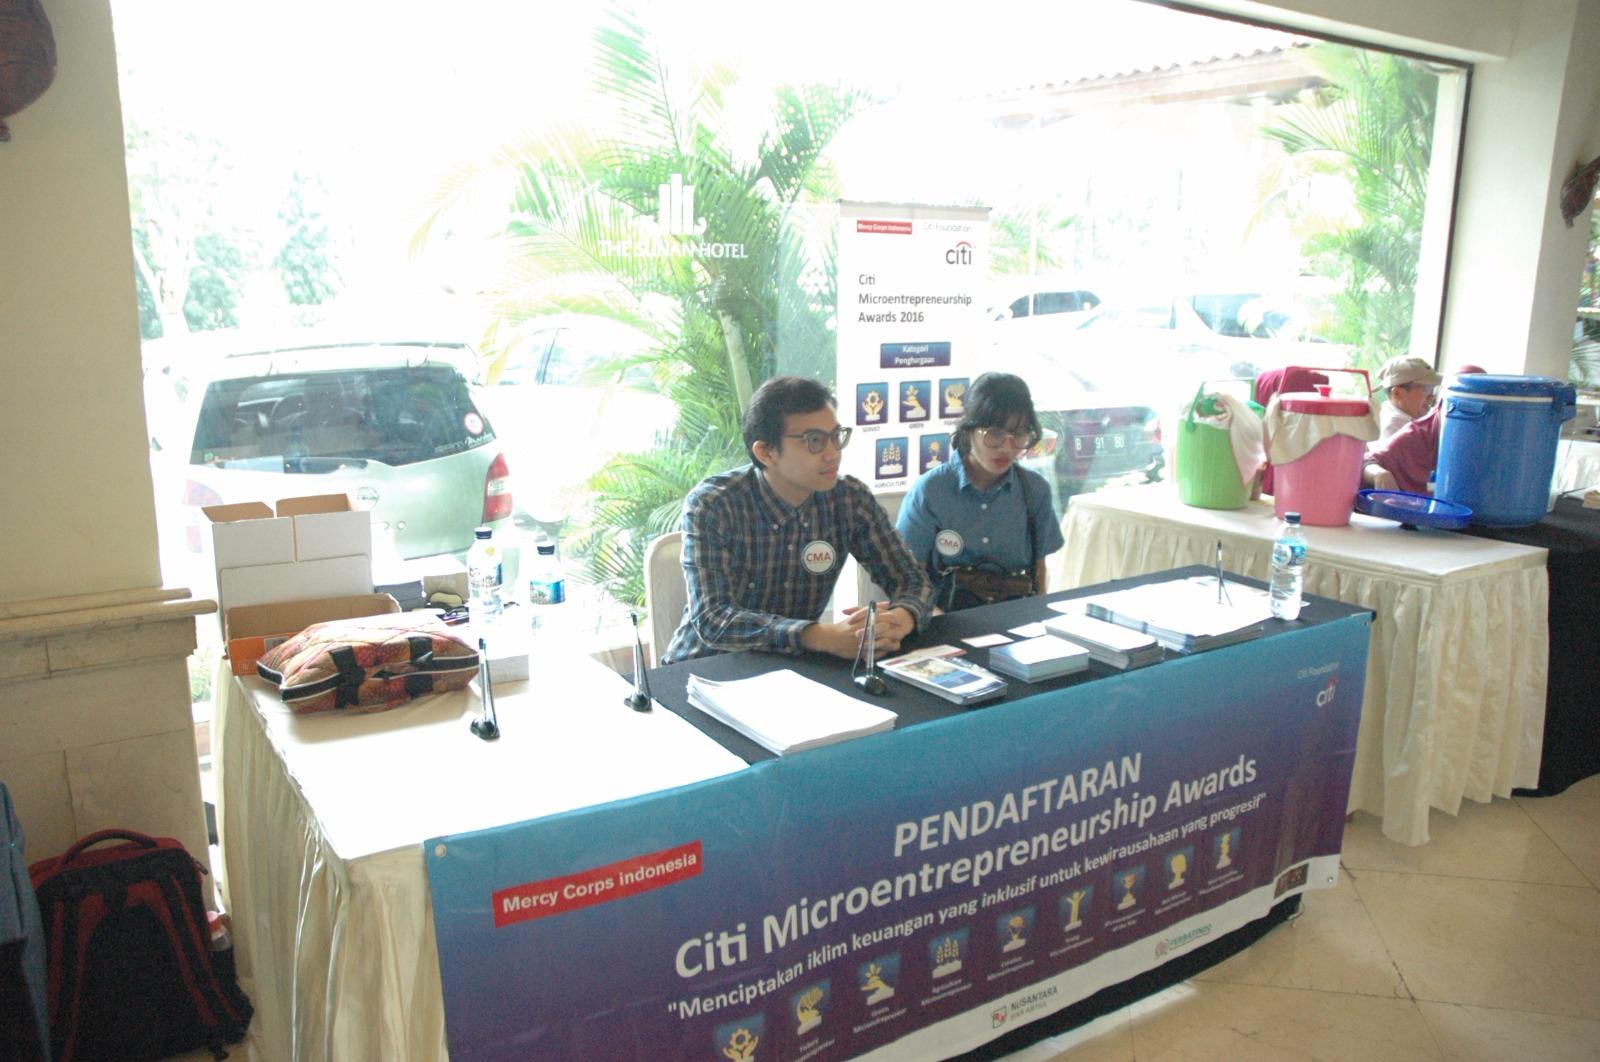 Booth Citi Microentrepreneurship Awards